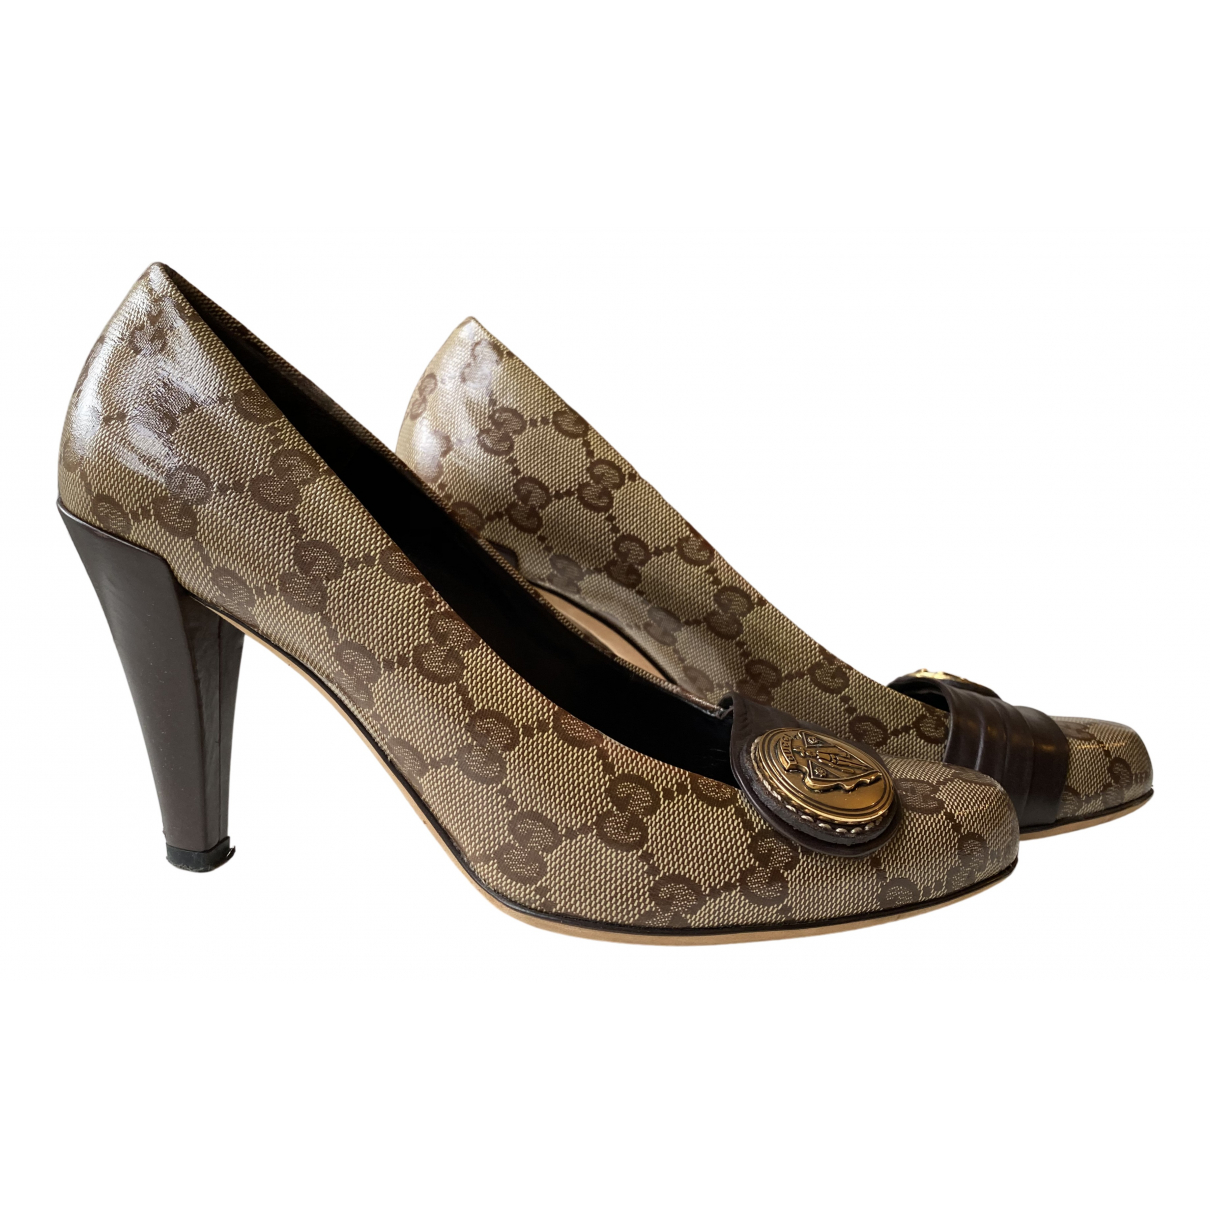 Gucci N Beige Cloth Heels for Women 37.5 EU